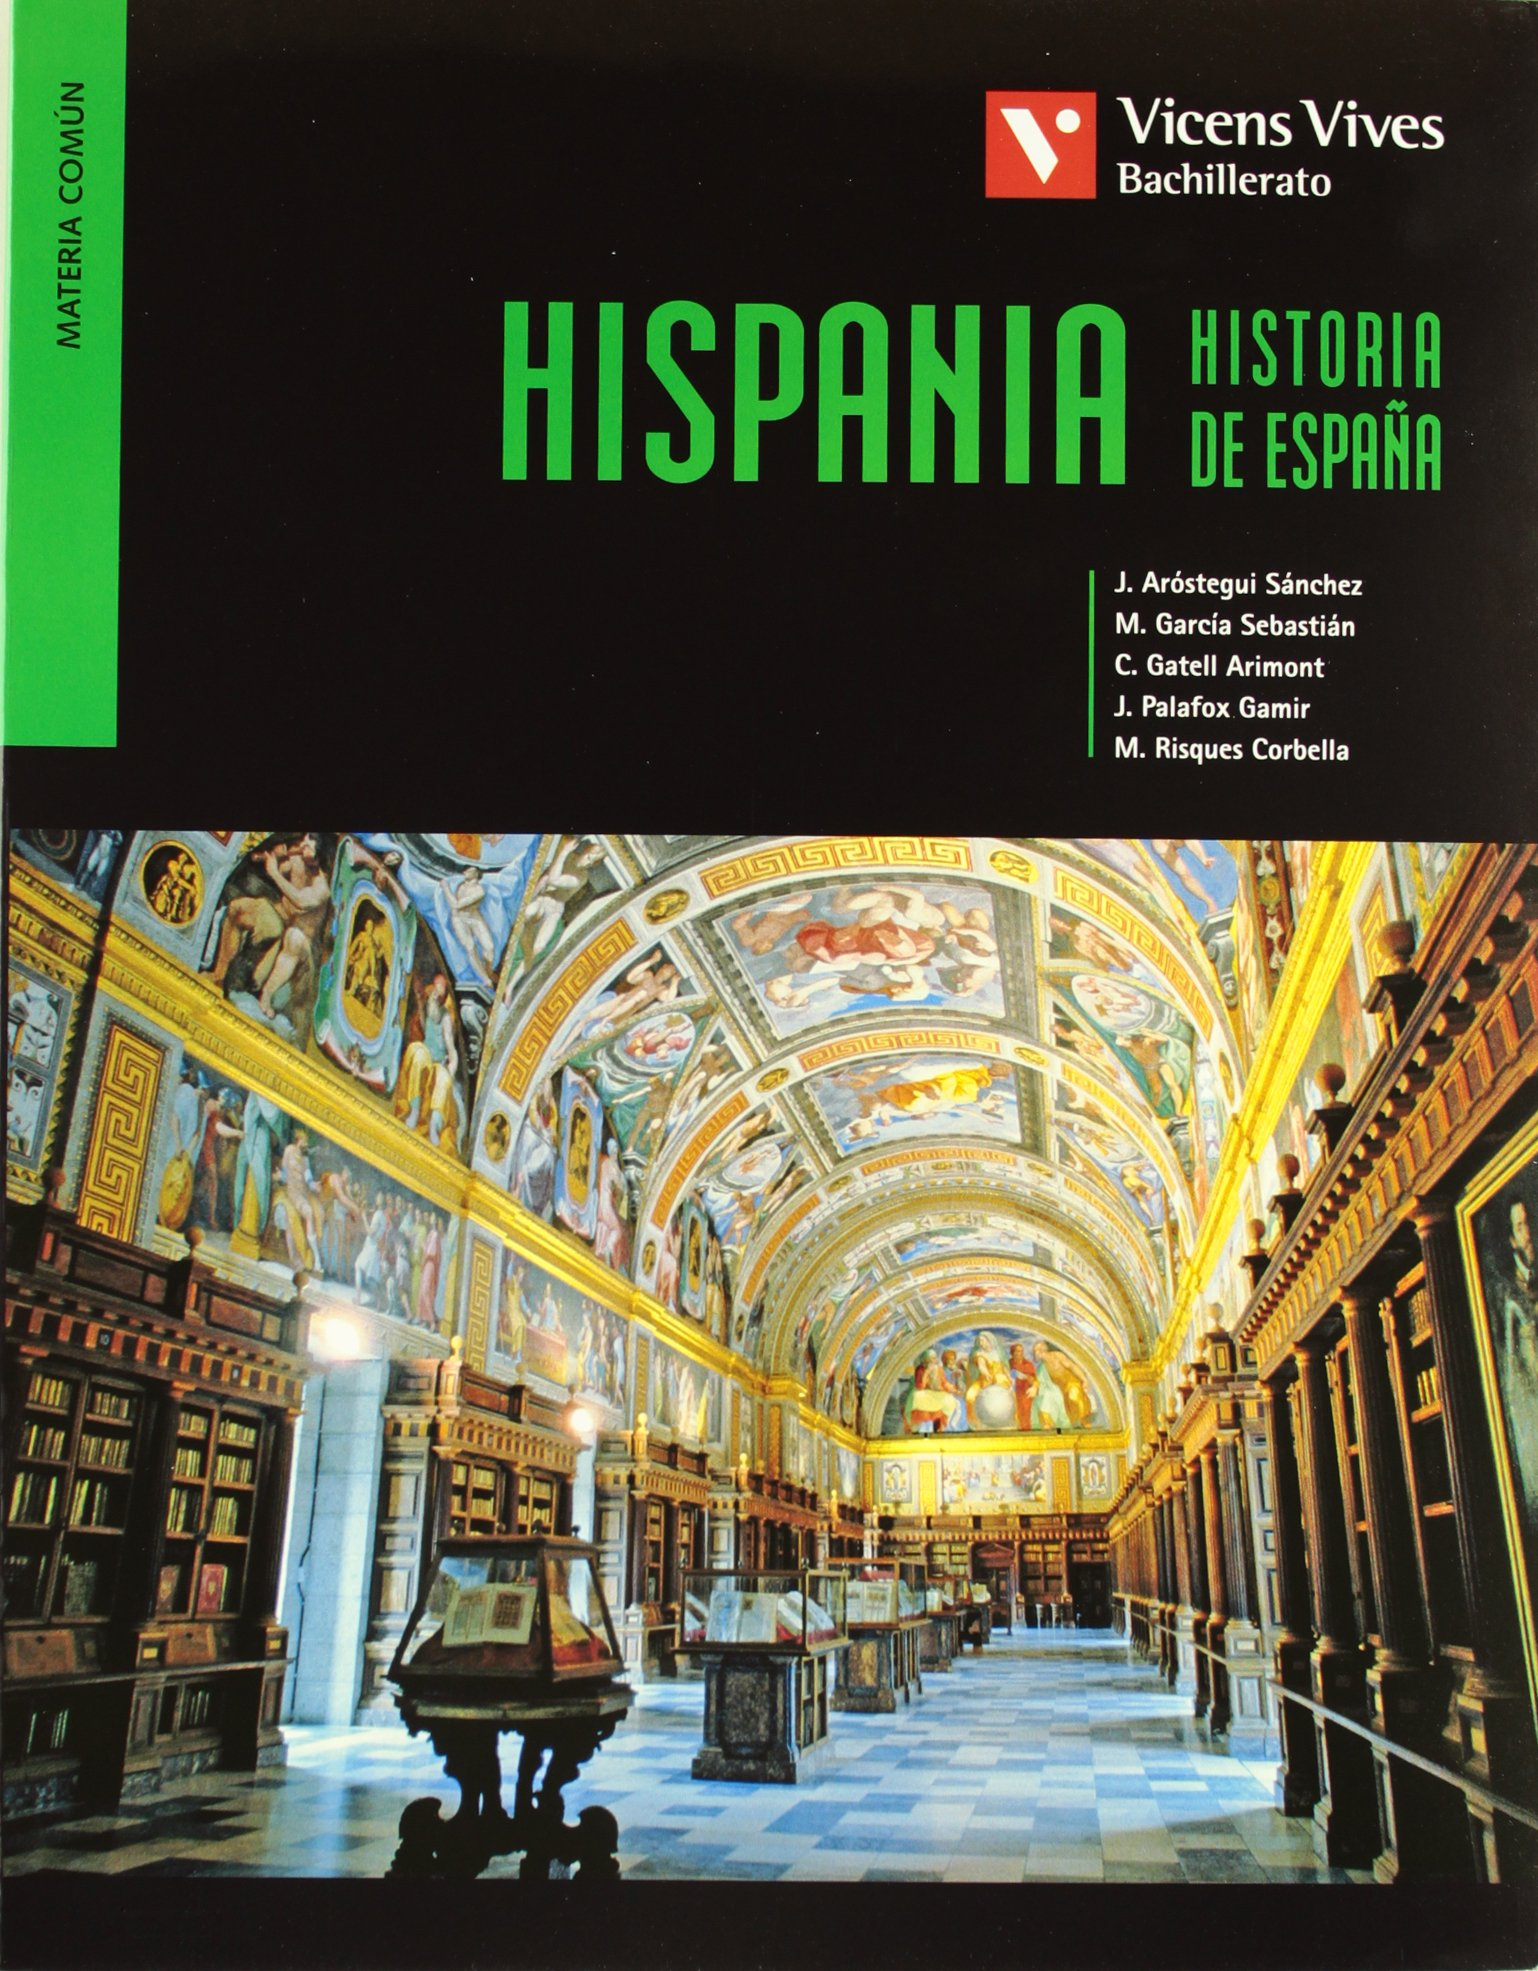 Historia De España La Rioja Separata - 9788431670856: Amazon.es: Rivero Noval, Mari Carmen: Libros